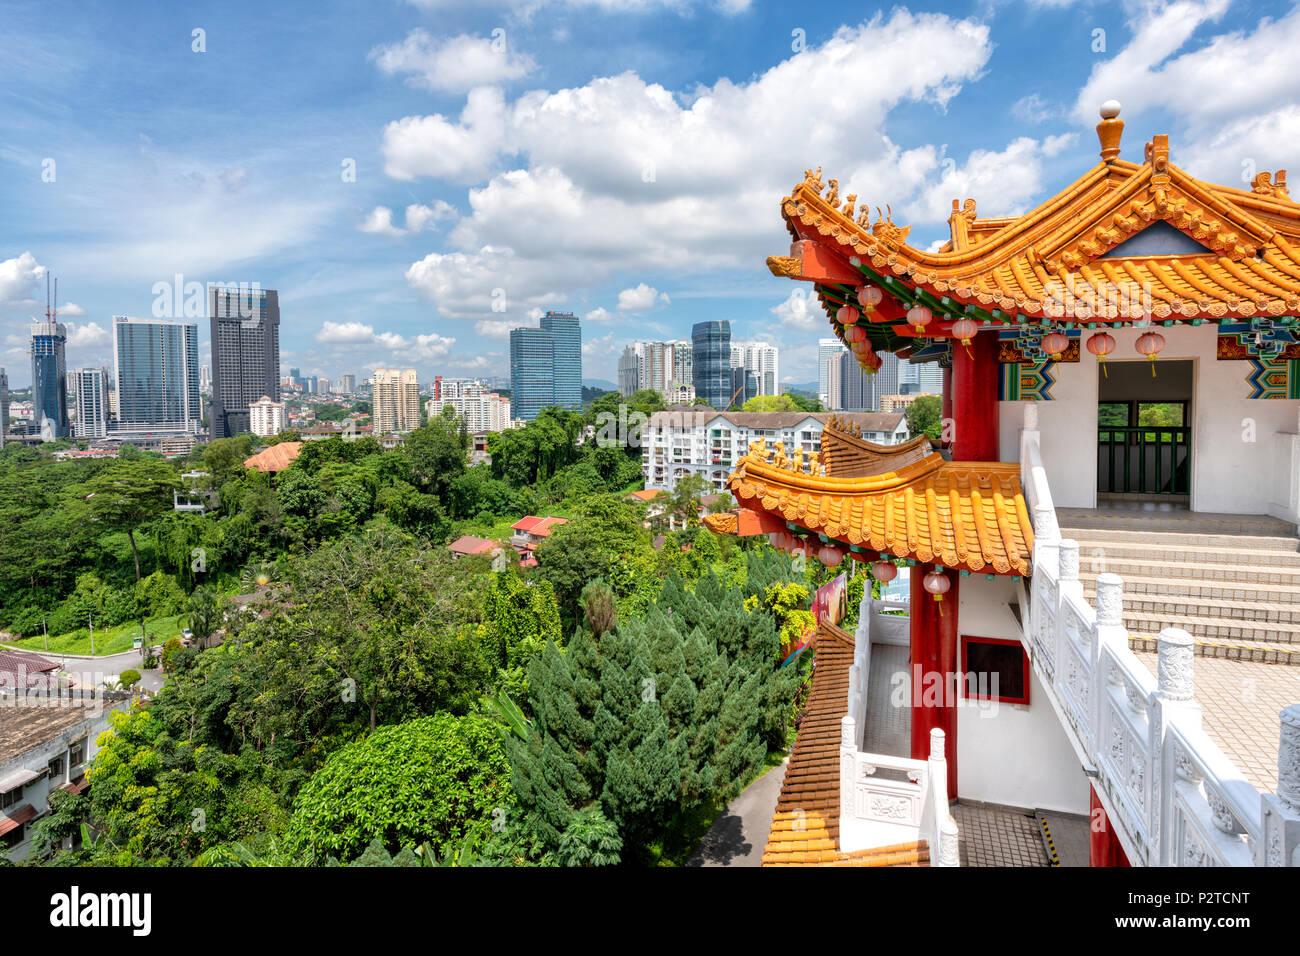 Die Thean Hou Tempel am Stadtrand von Kuala Lumpur, Malaysia Stockbild